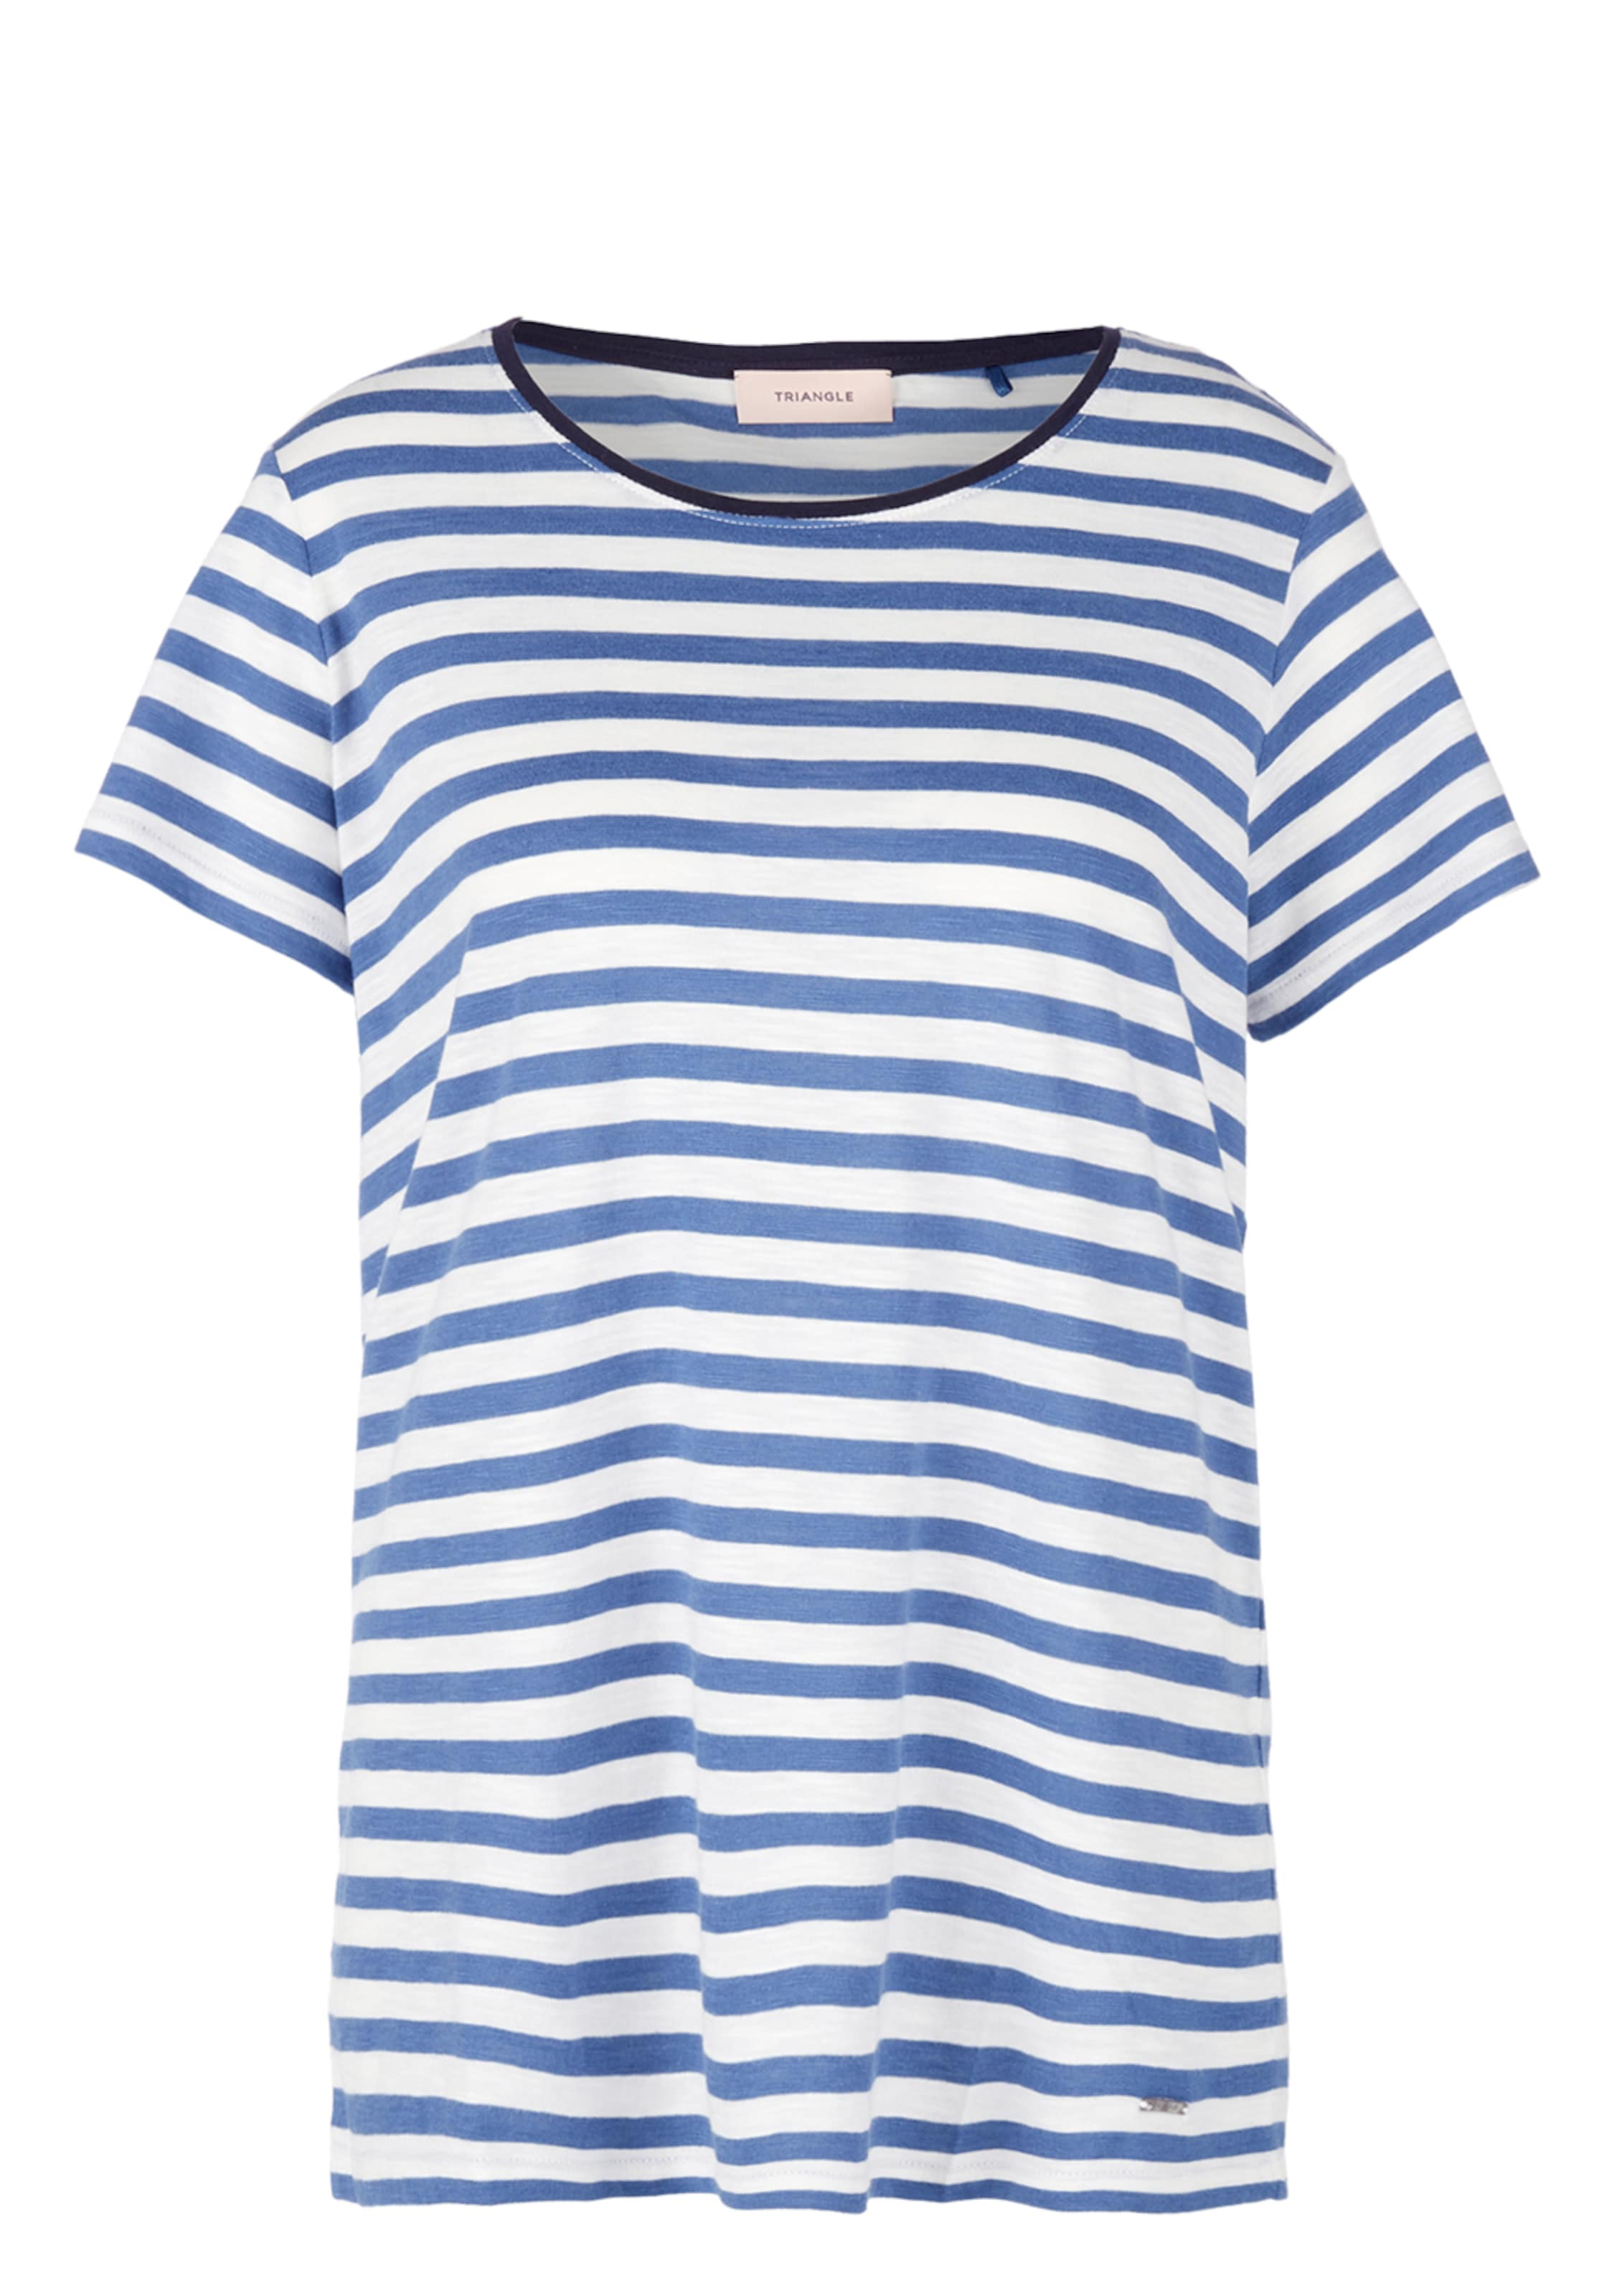 Weiß Triangle BlauSchwarz Shirt Shirt In Triangle Nw08nm